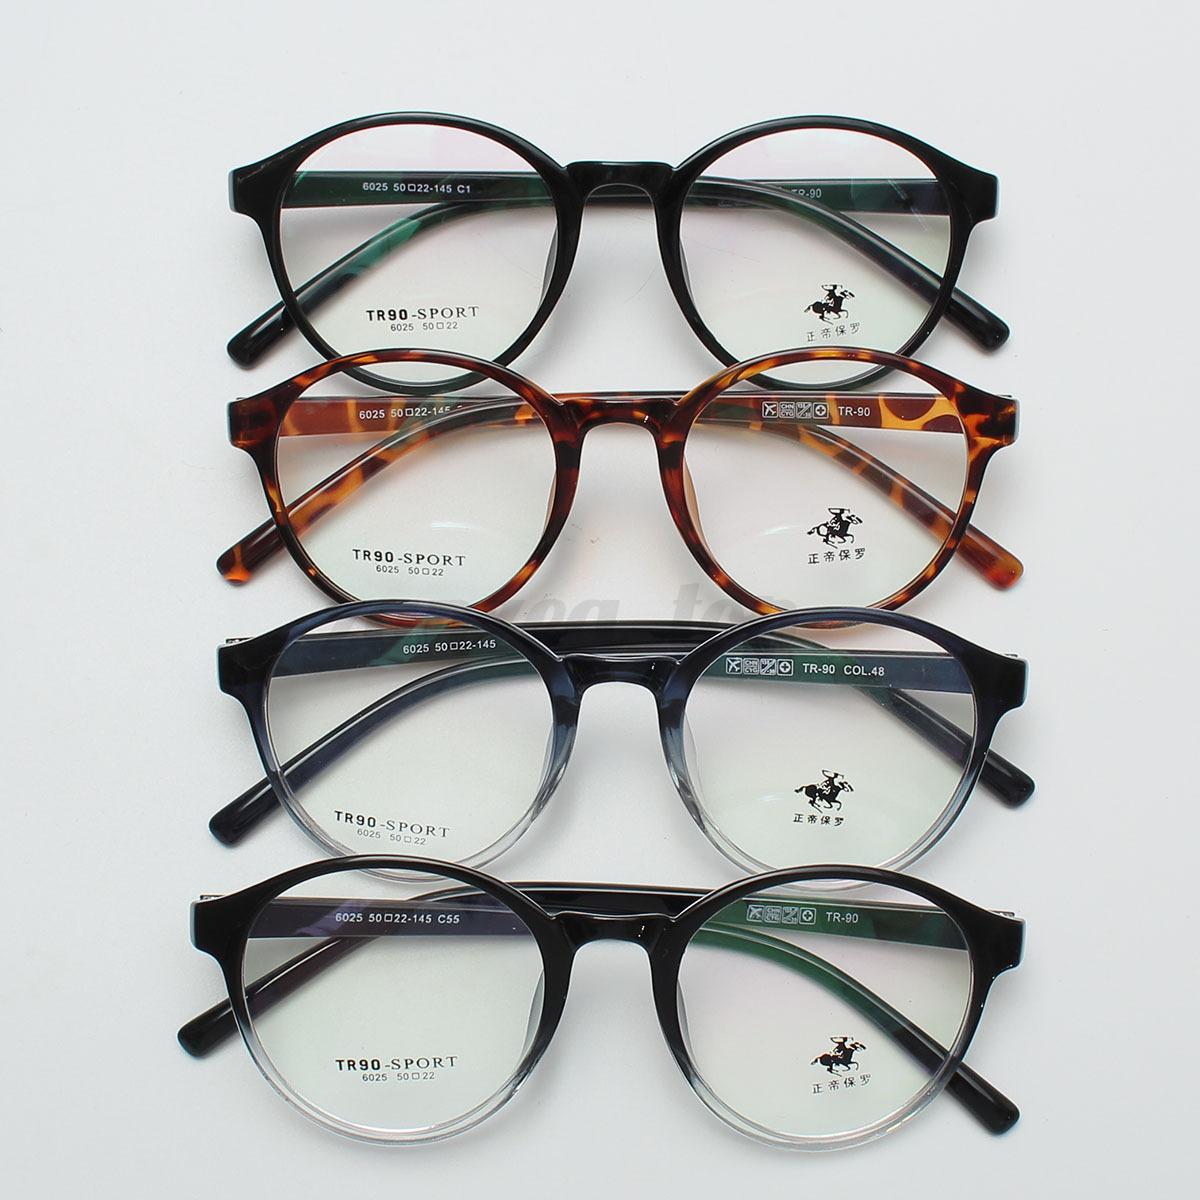 Damen Herren Brille Brillen Mode Retro Vintage Nerd Lesebrillen ...